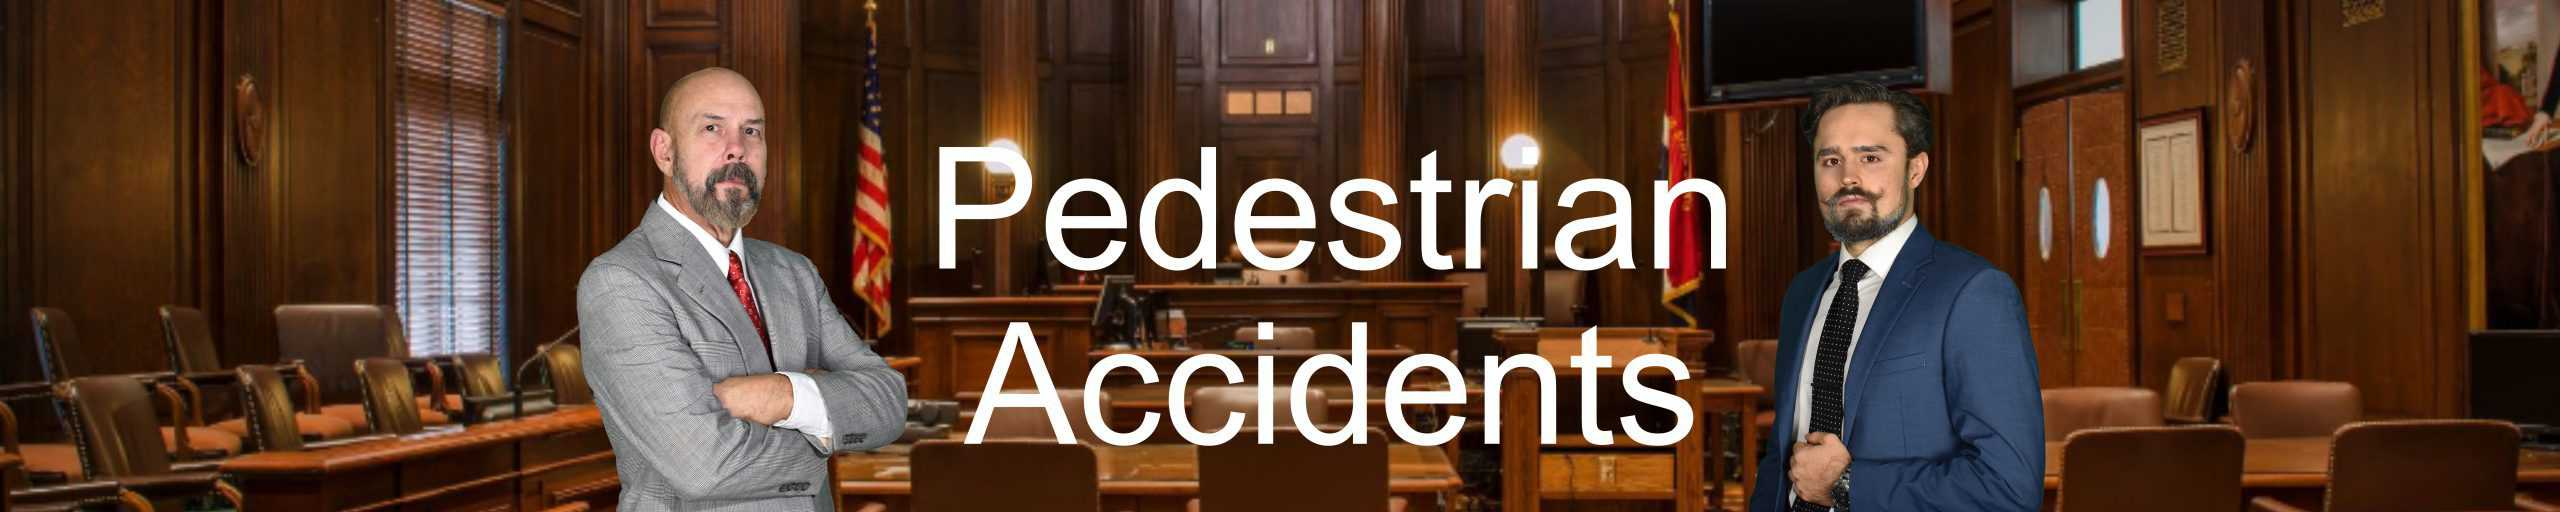 Pedestrian-Accidents-Personal-Injury-Attorney-Lawyer-Hurt-Broken-Rear-End-Money-Settlement-Hospital-ER-Damage-Insurance-Company-Sidewalk-Crosswalk-Hit-Walking